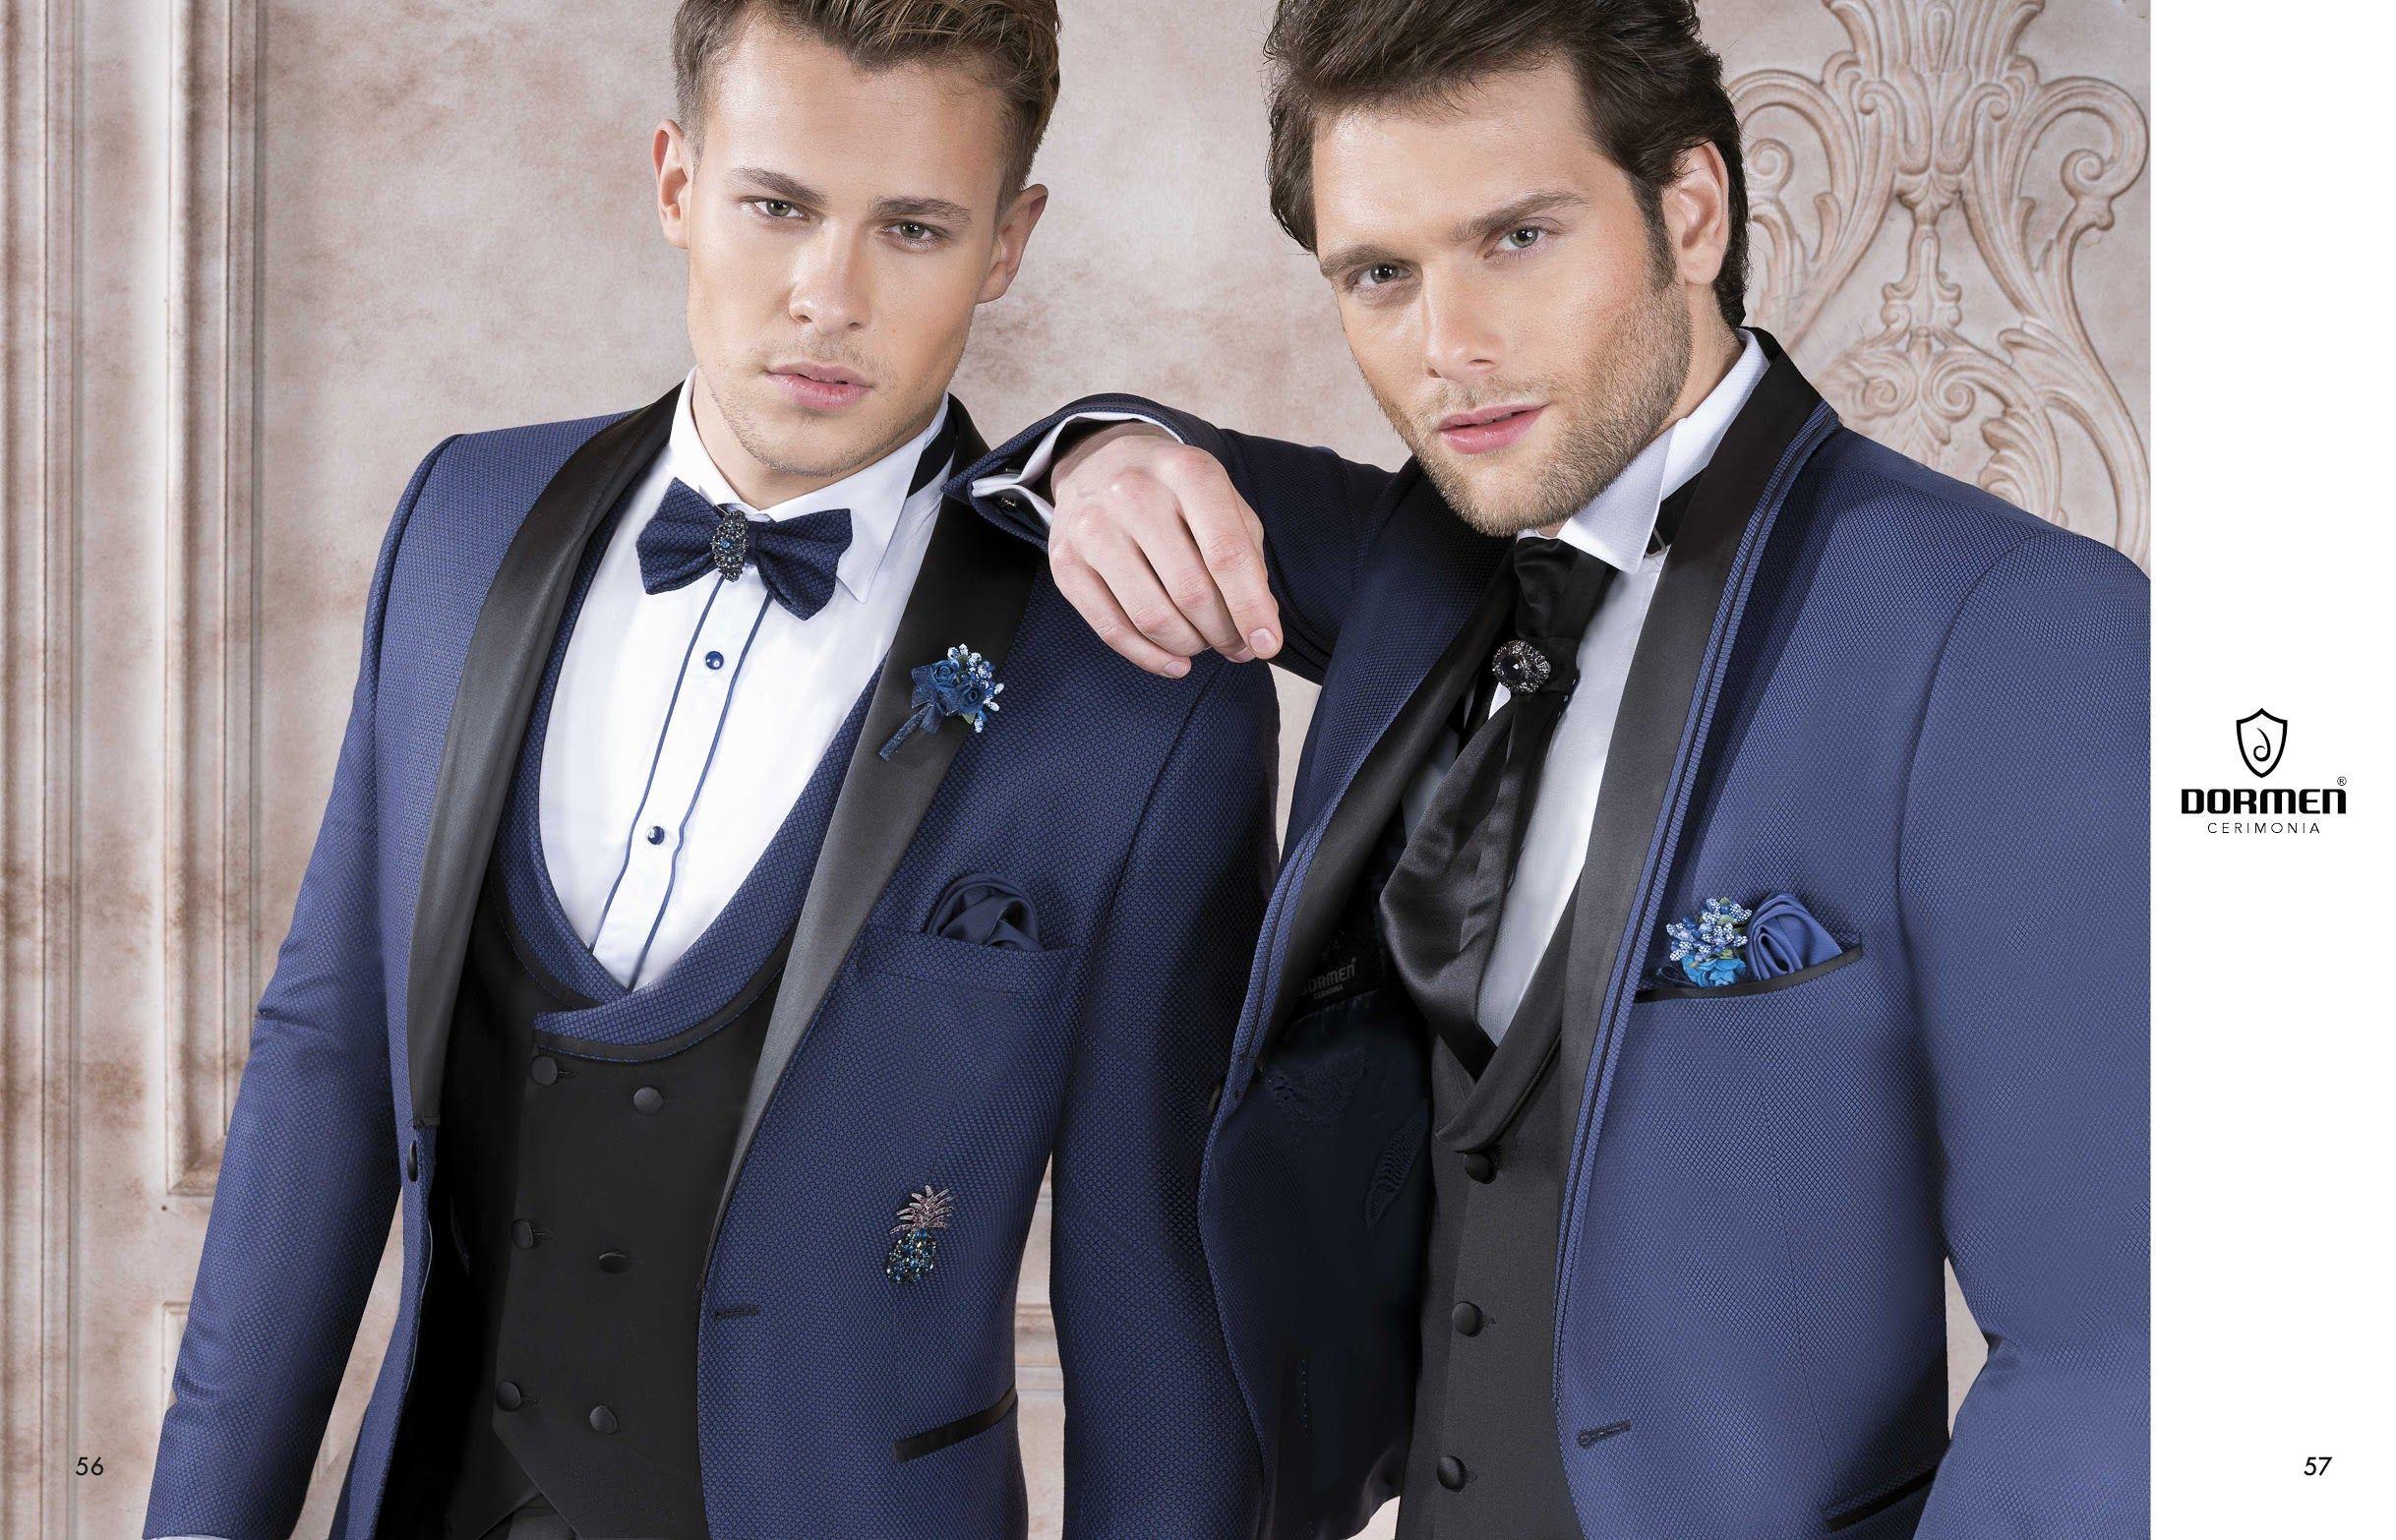 bdc502e7addc4 Yeni sezon damatlık ve takım elbise modelleri. New season tuxedo and men  suit models.